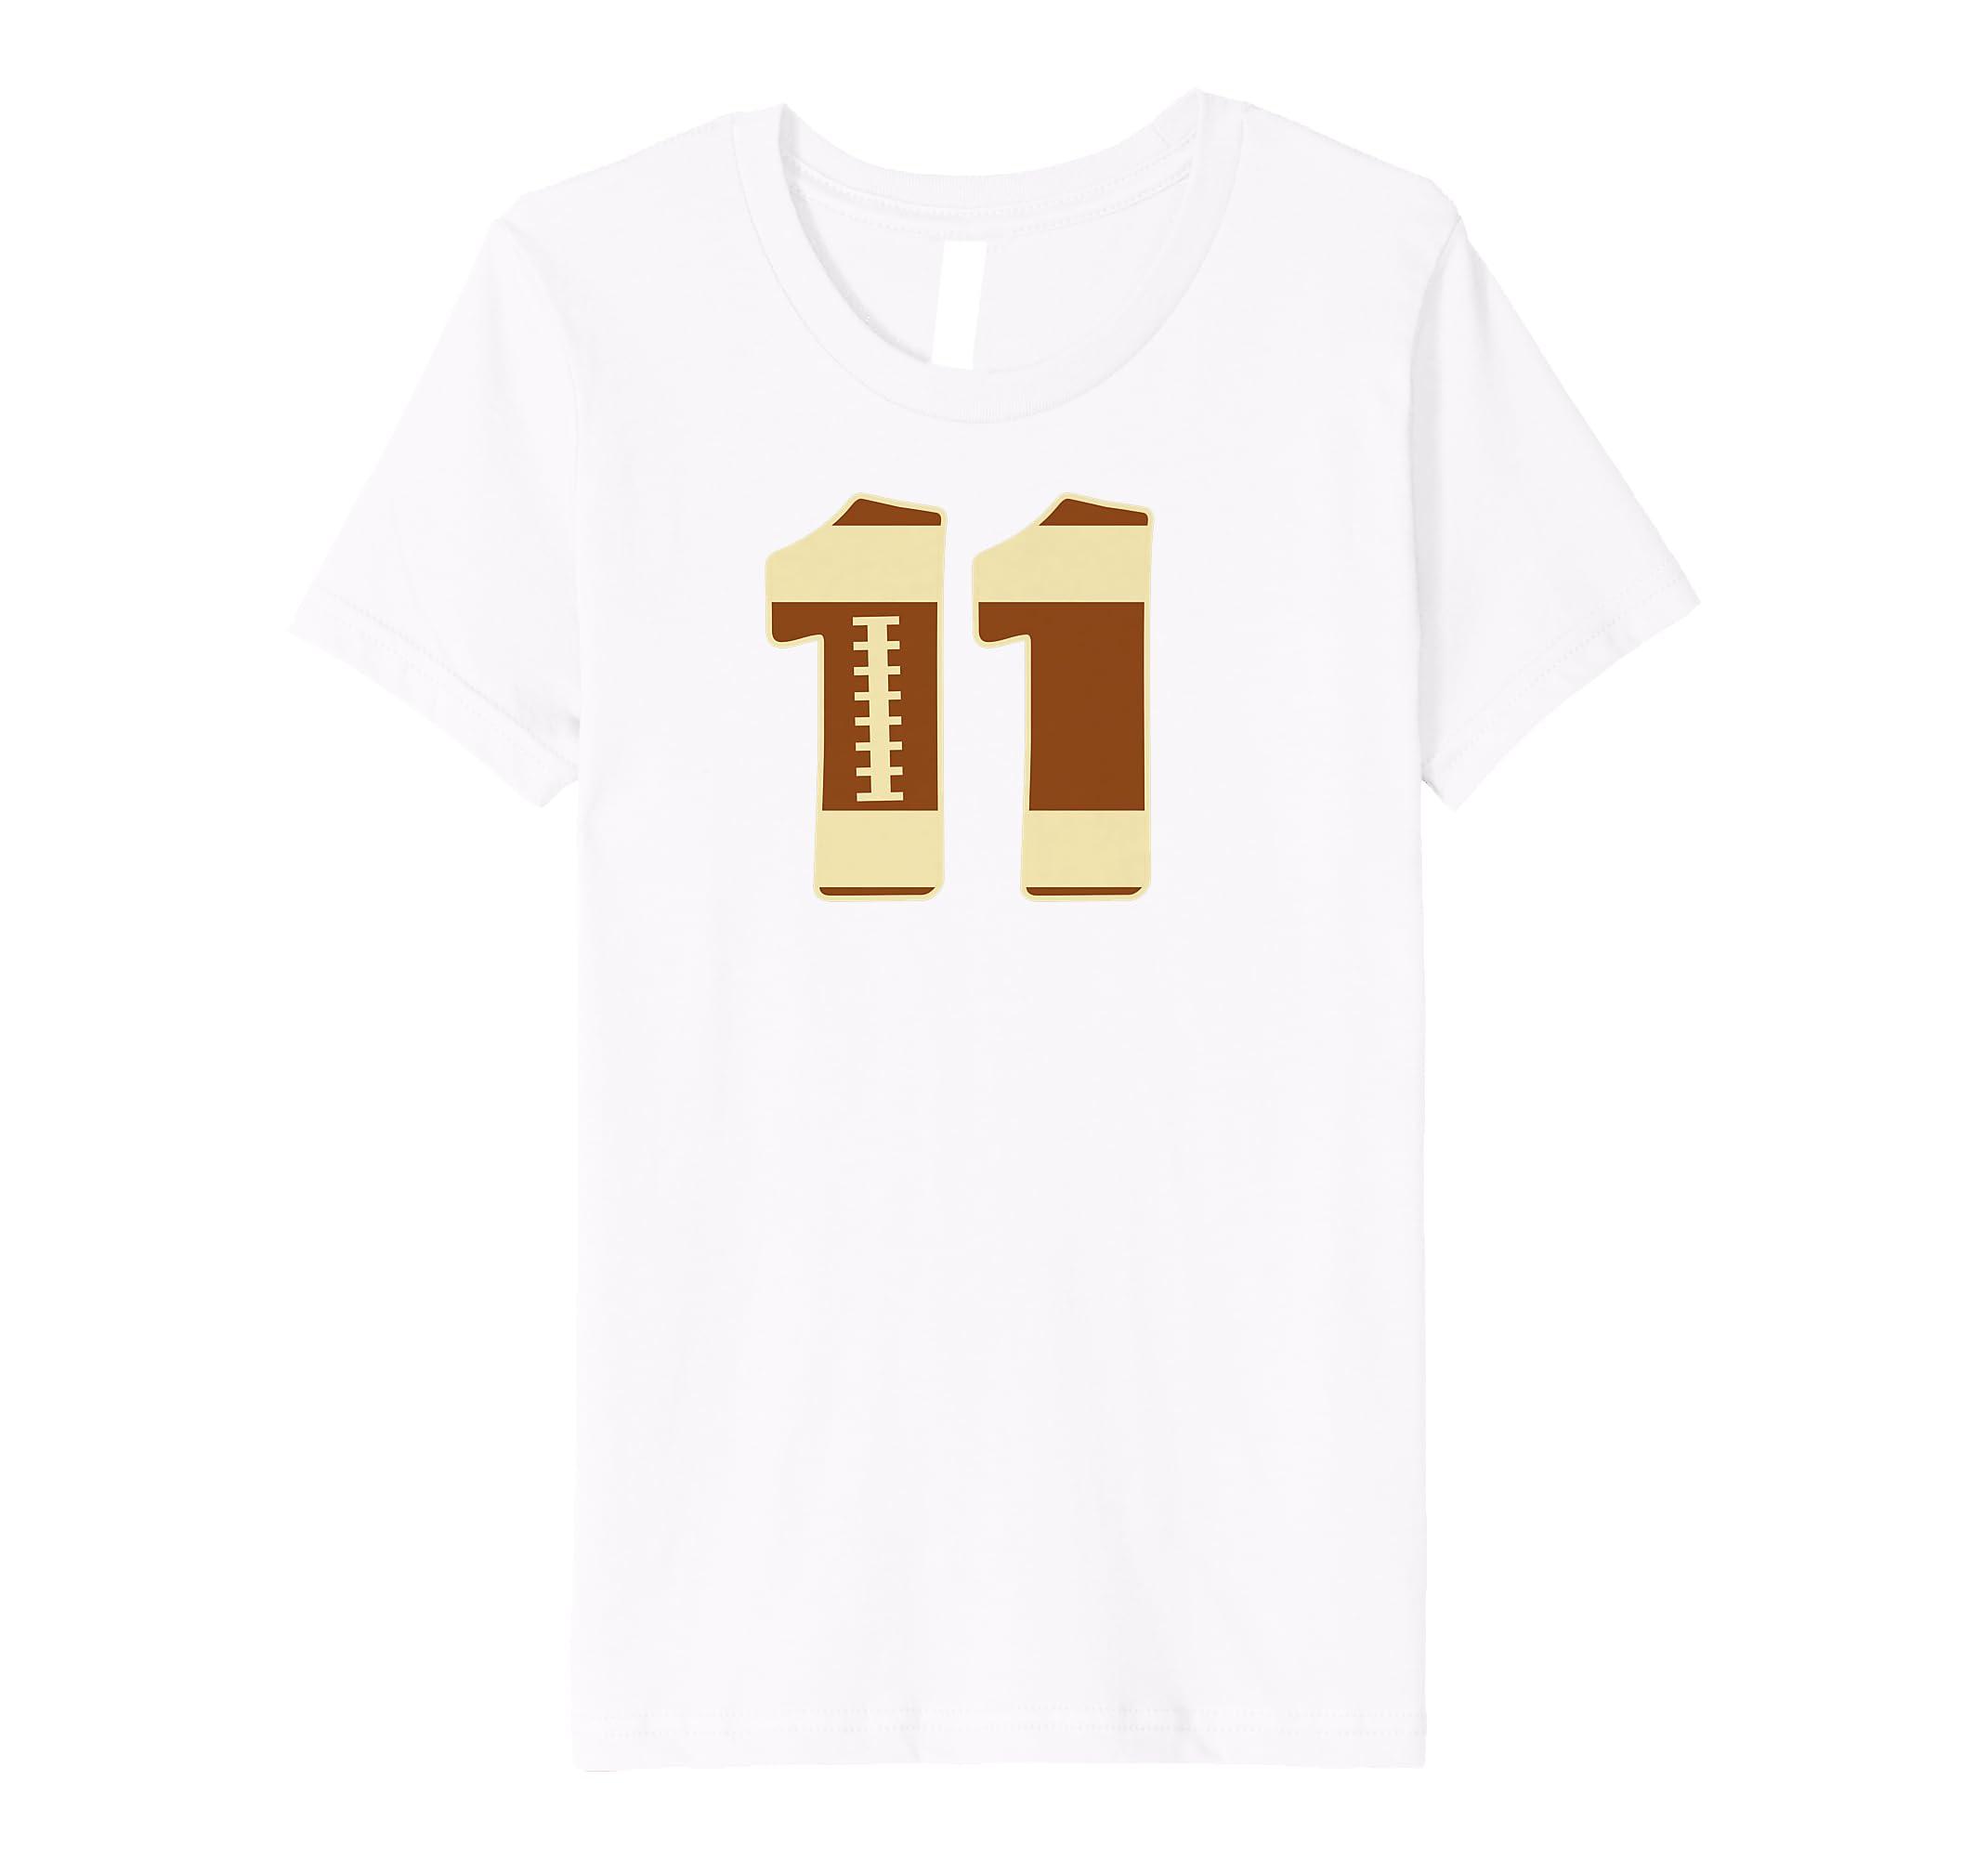 b80b9108 Amazon.com: Number #11 Football Team Shirt - American Rugby Field Ball:  Clothing